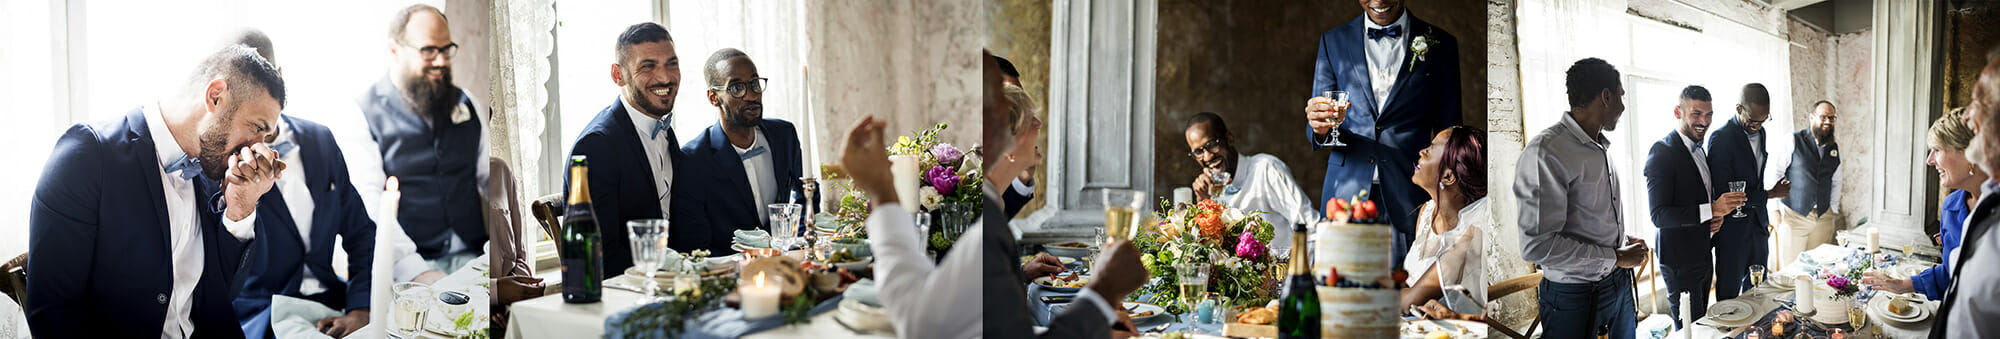 photographing the wedding speech